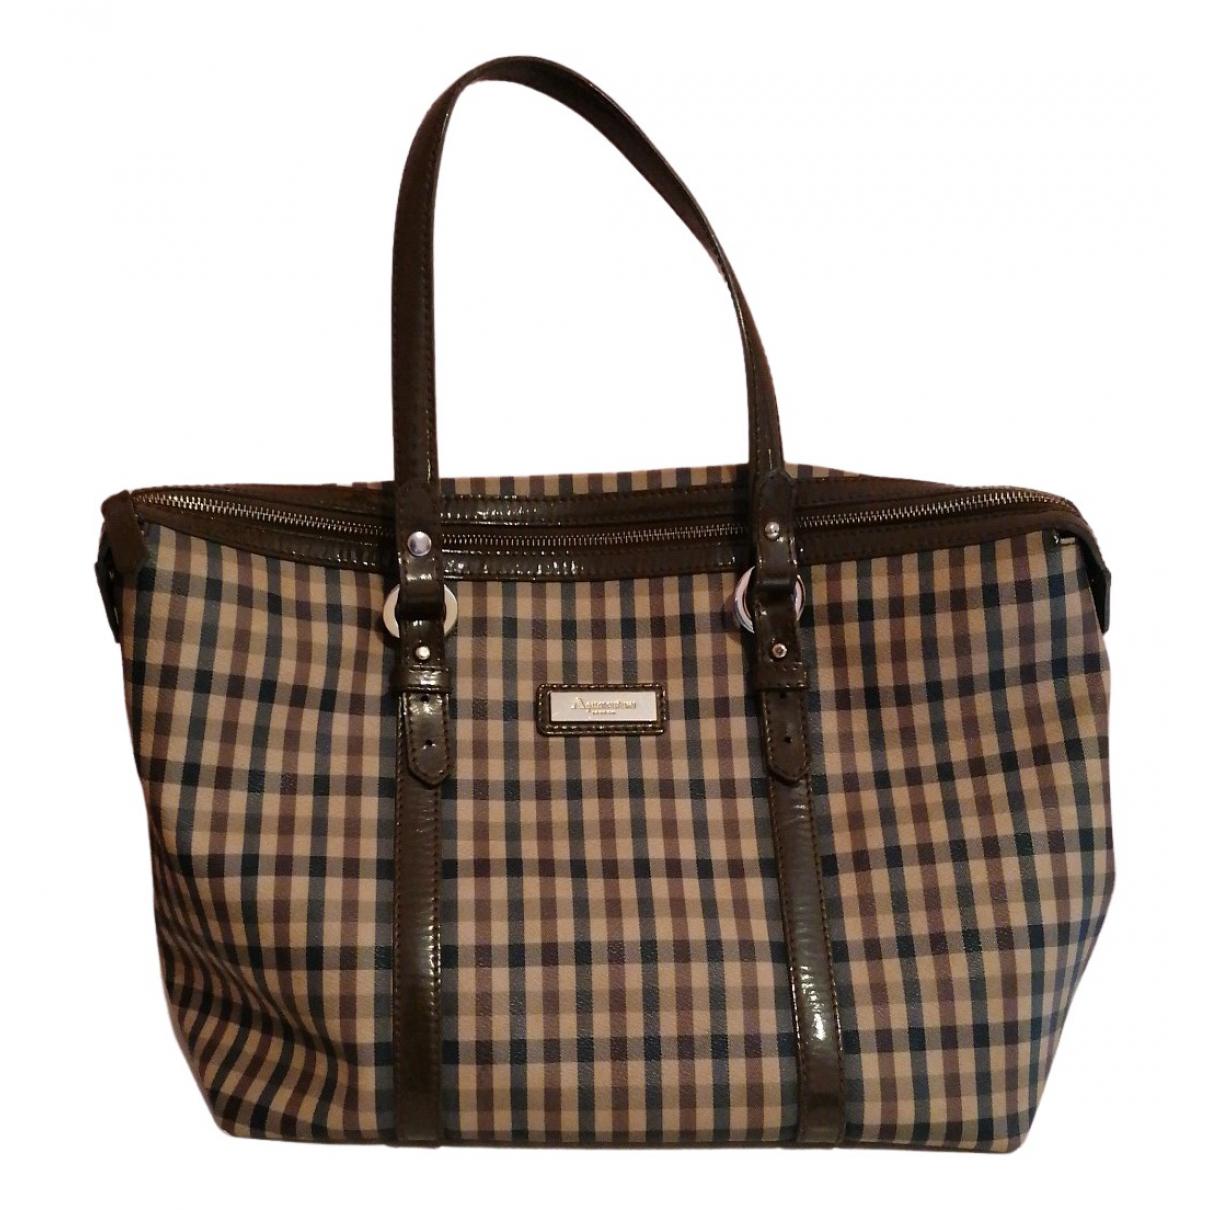 Aquascutum N Leather handbag for Women N